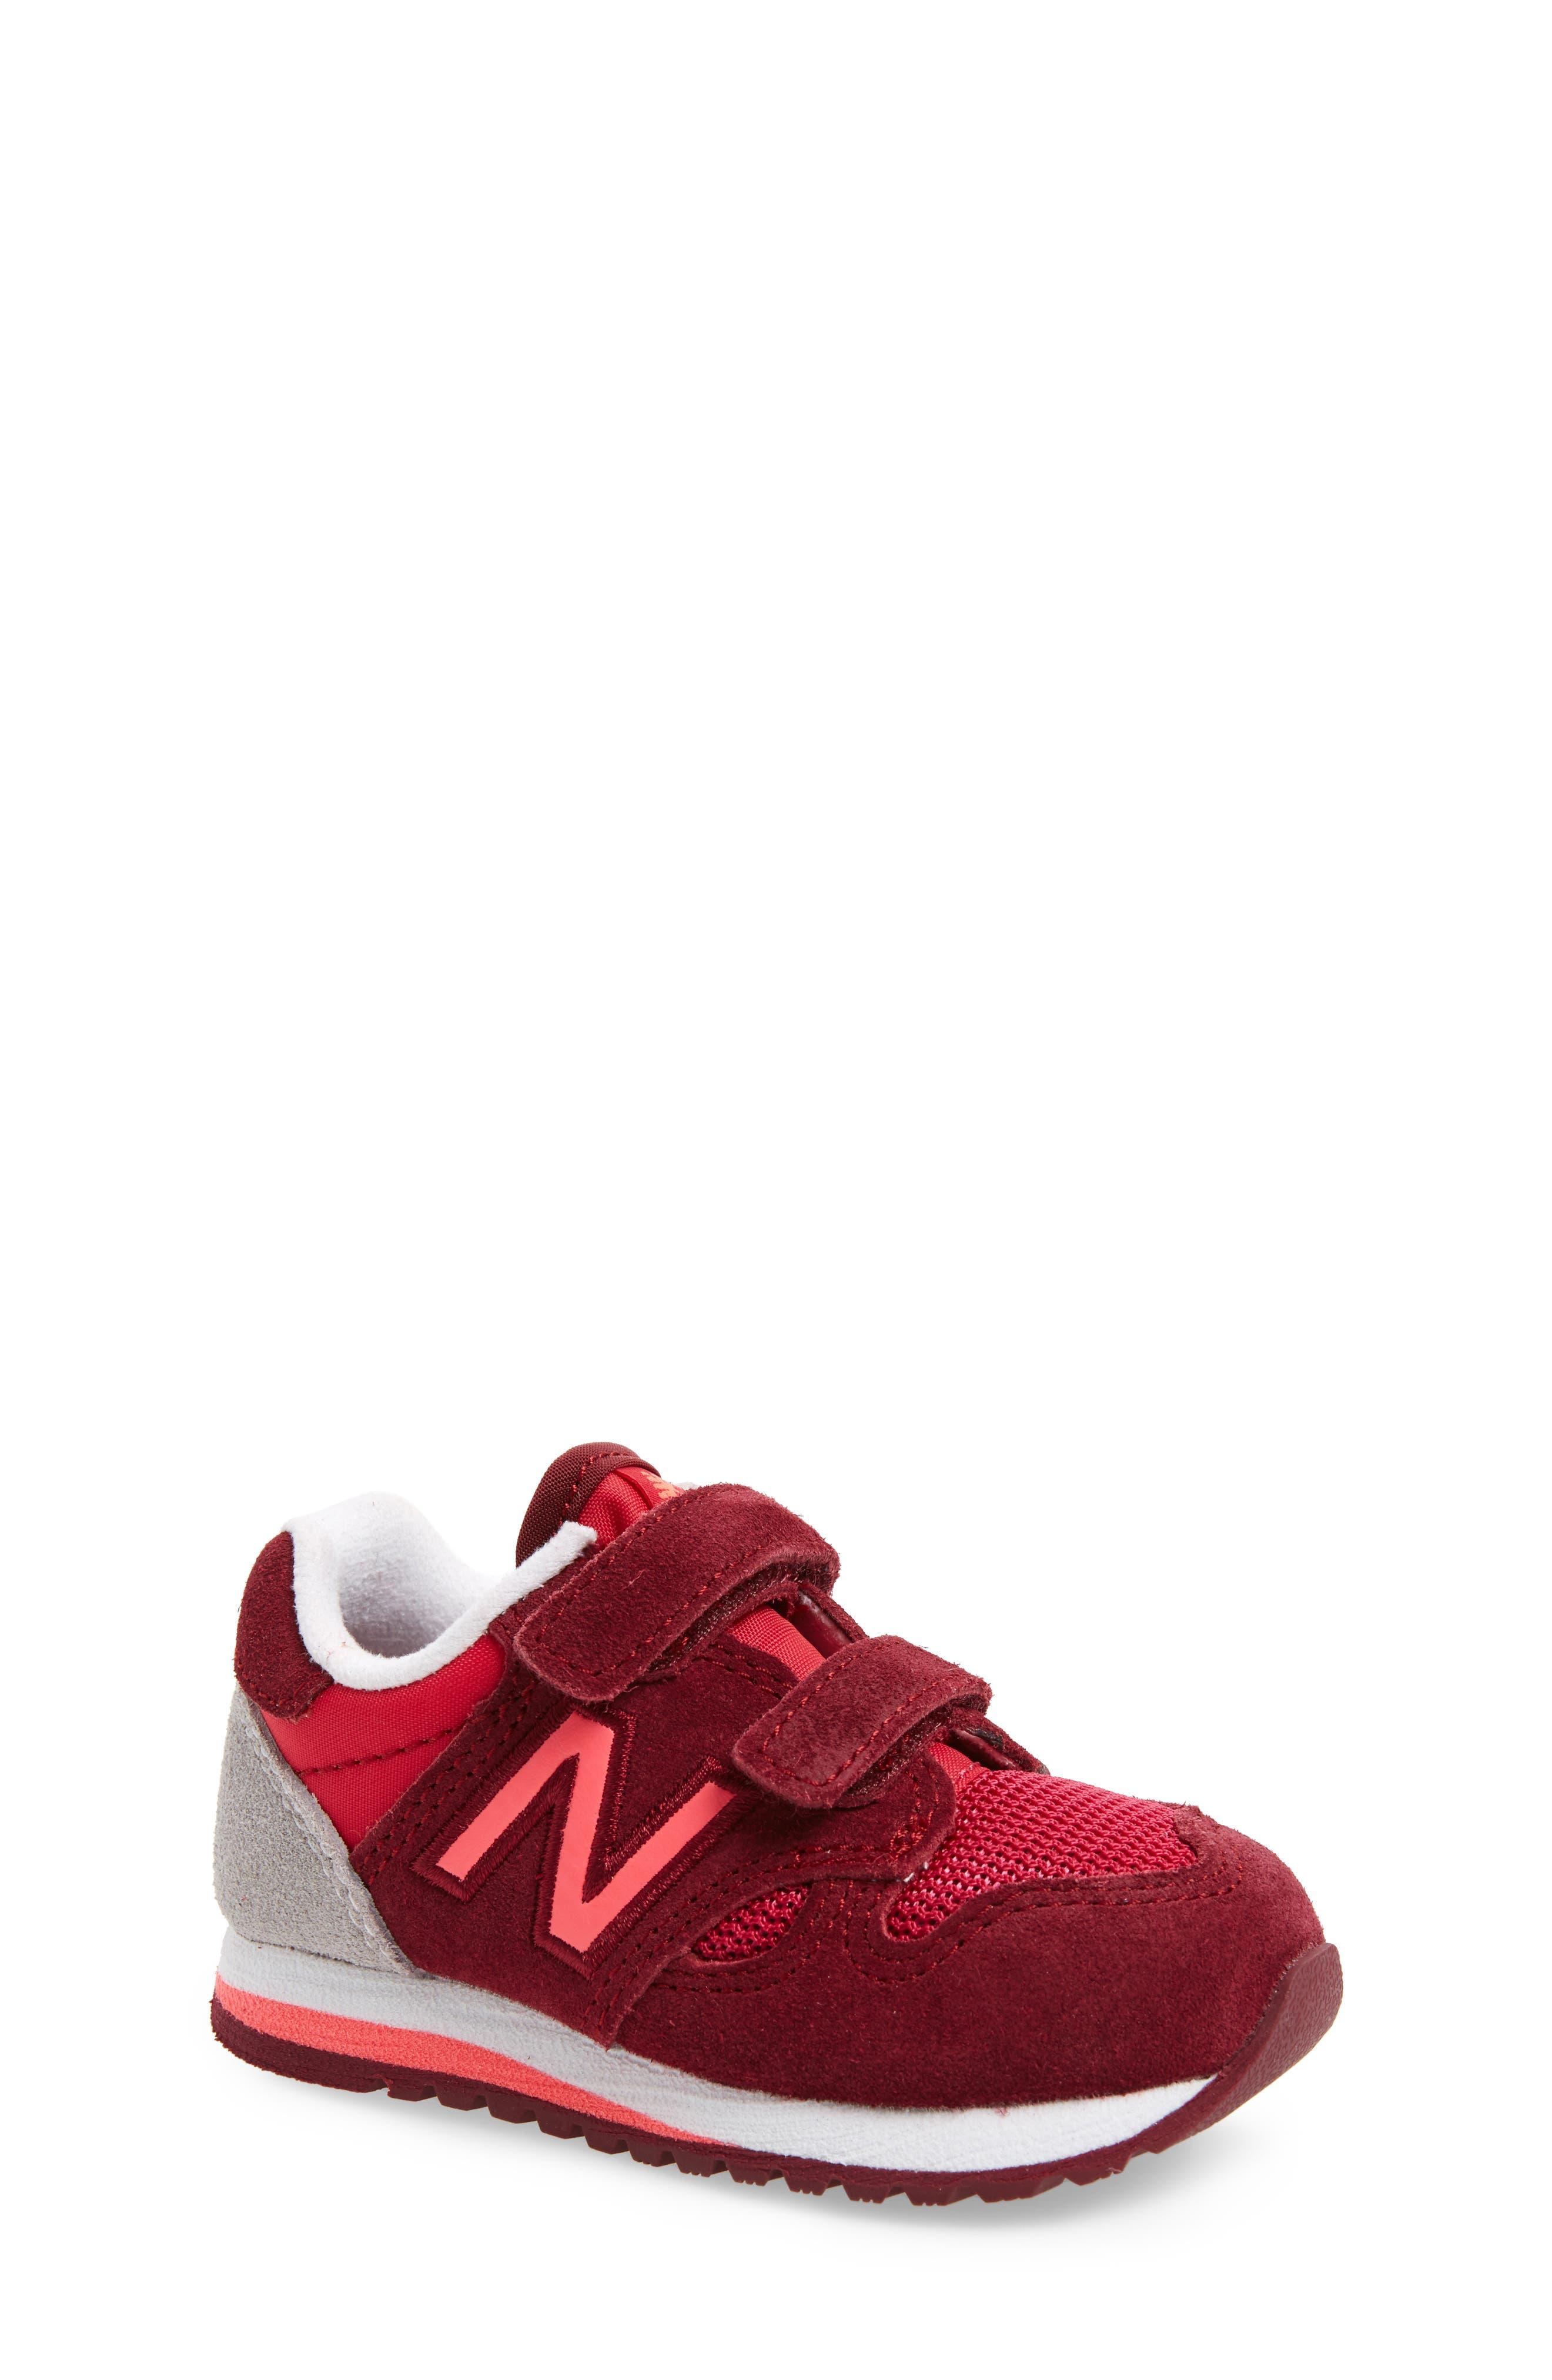 520 Sneaker,                             Main thumbnail 1, color,